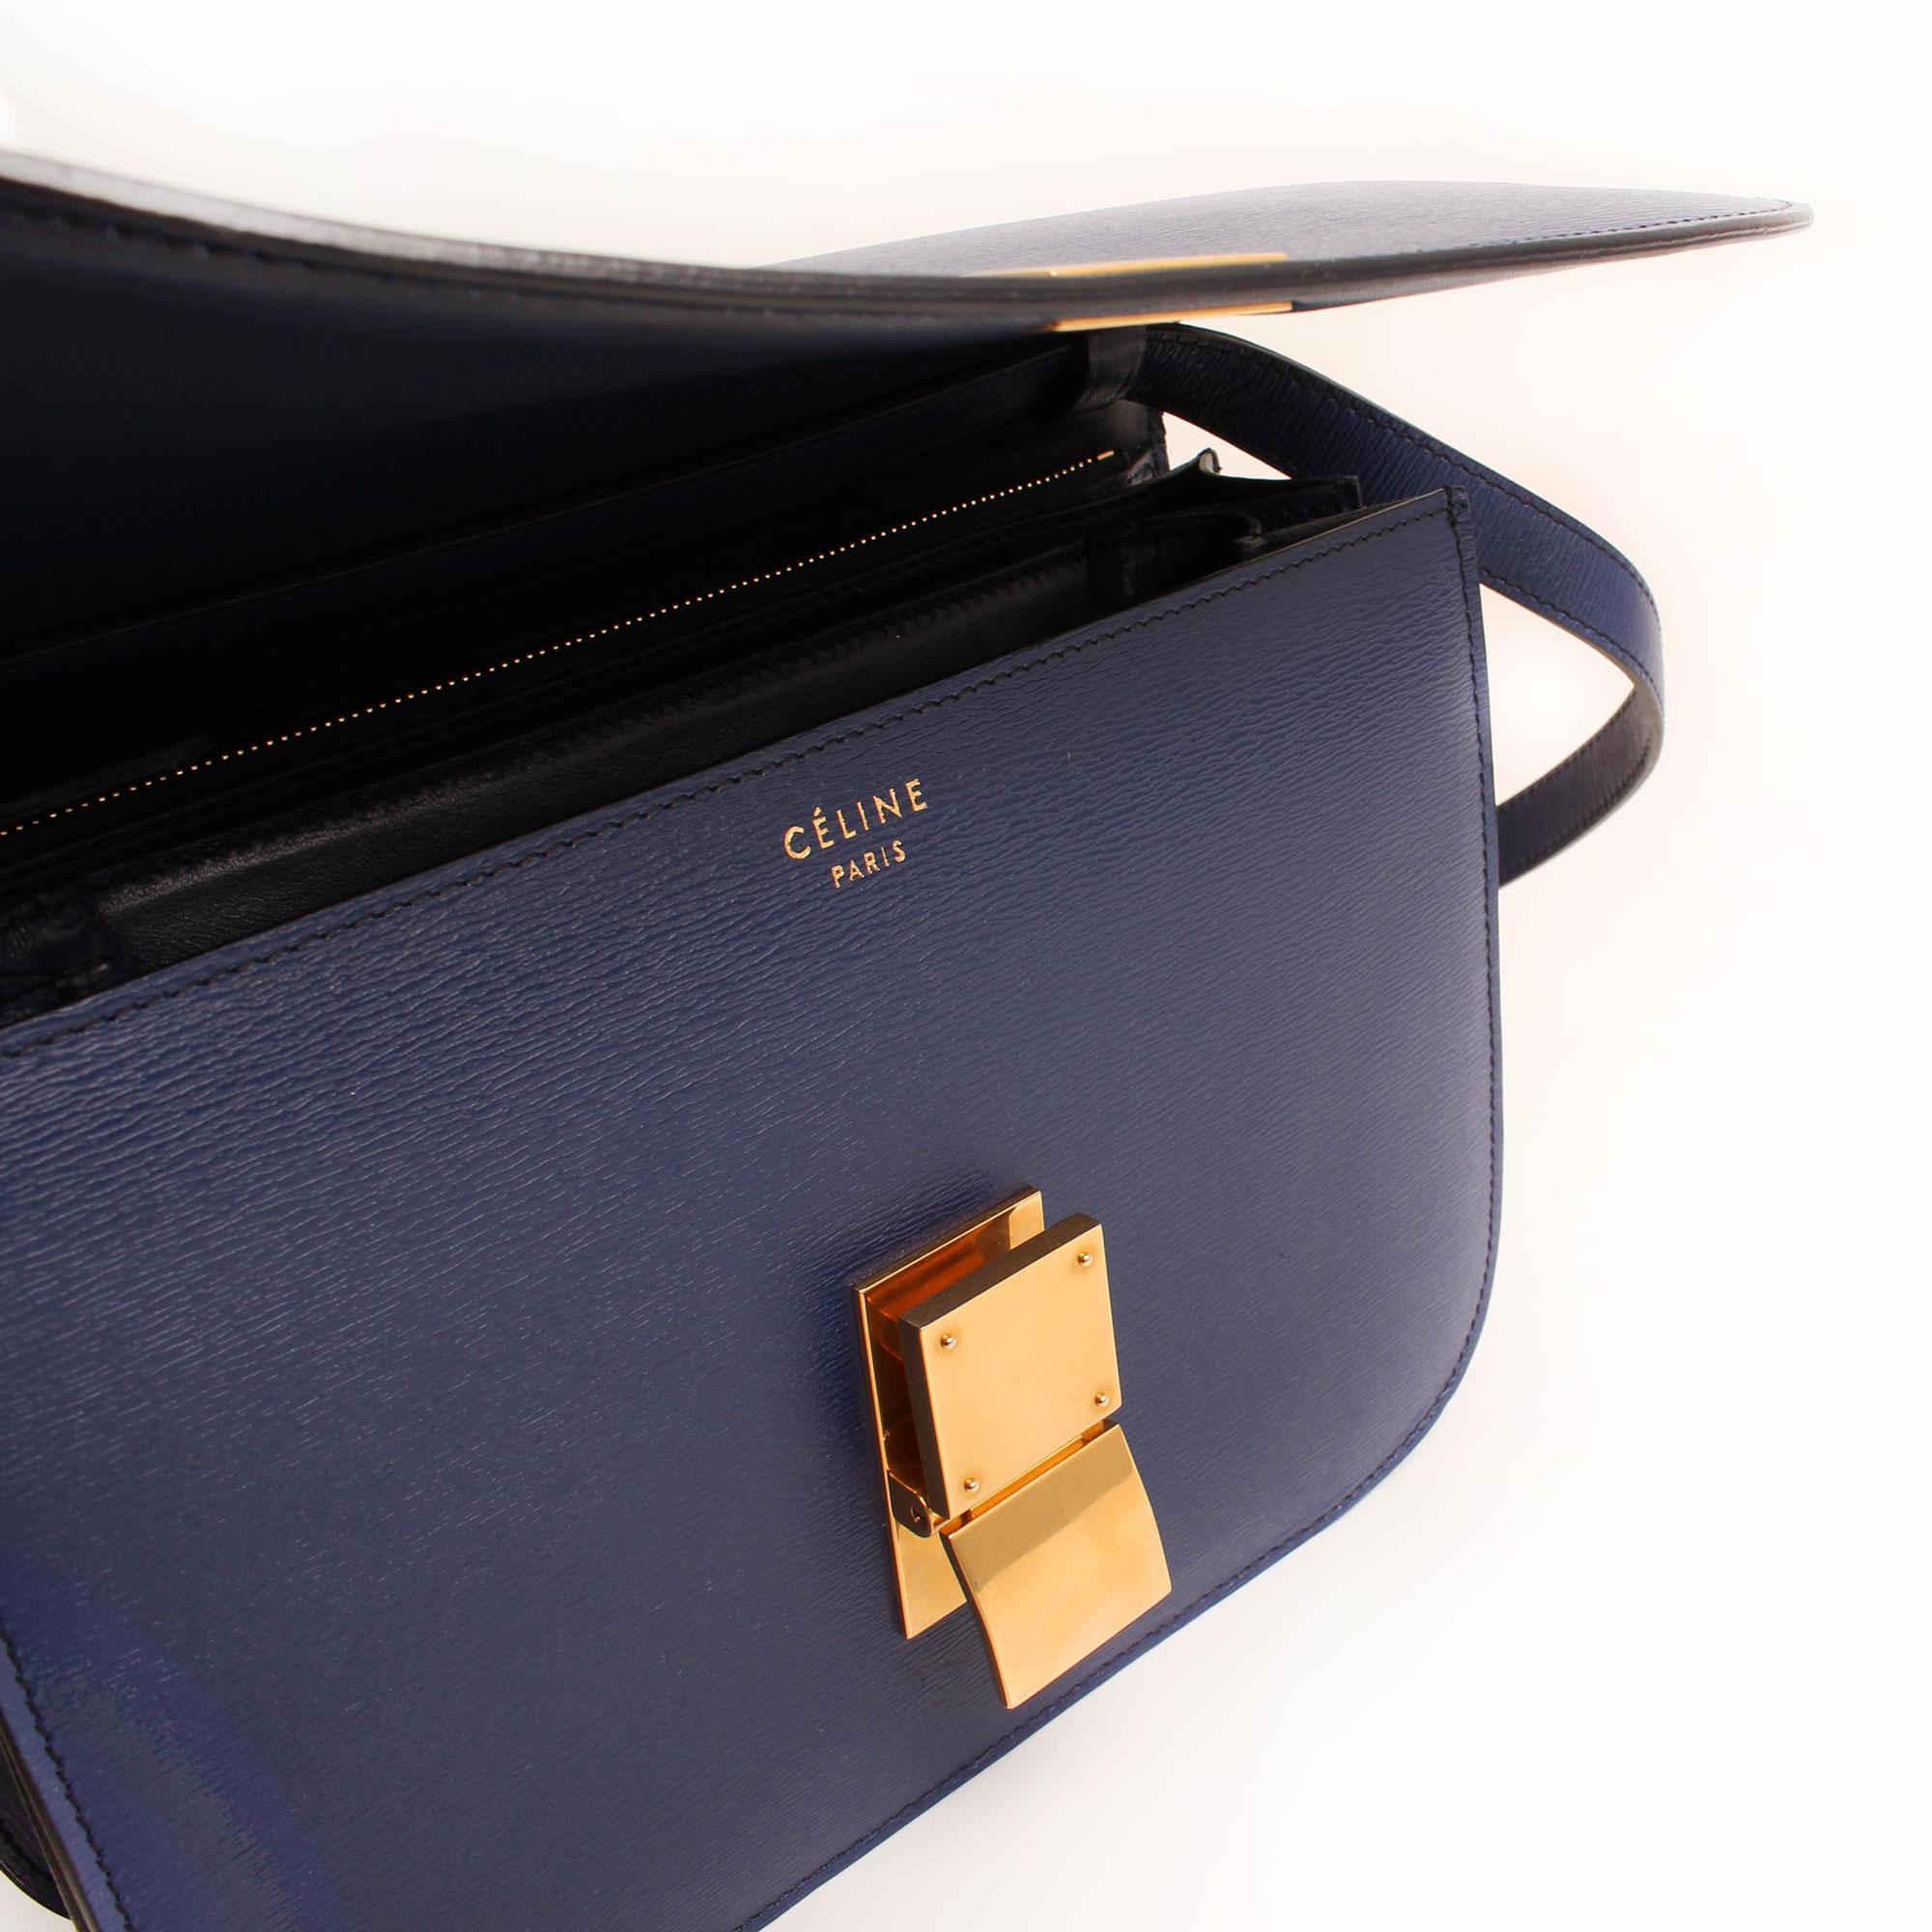 Imagen del bolso abierto del bolso celine box bag azul